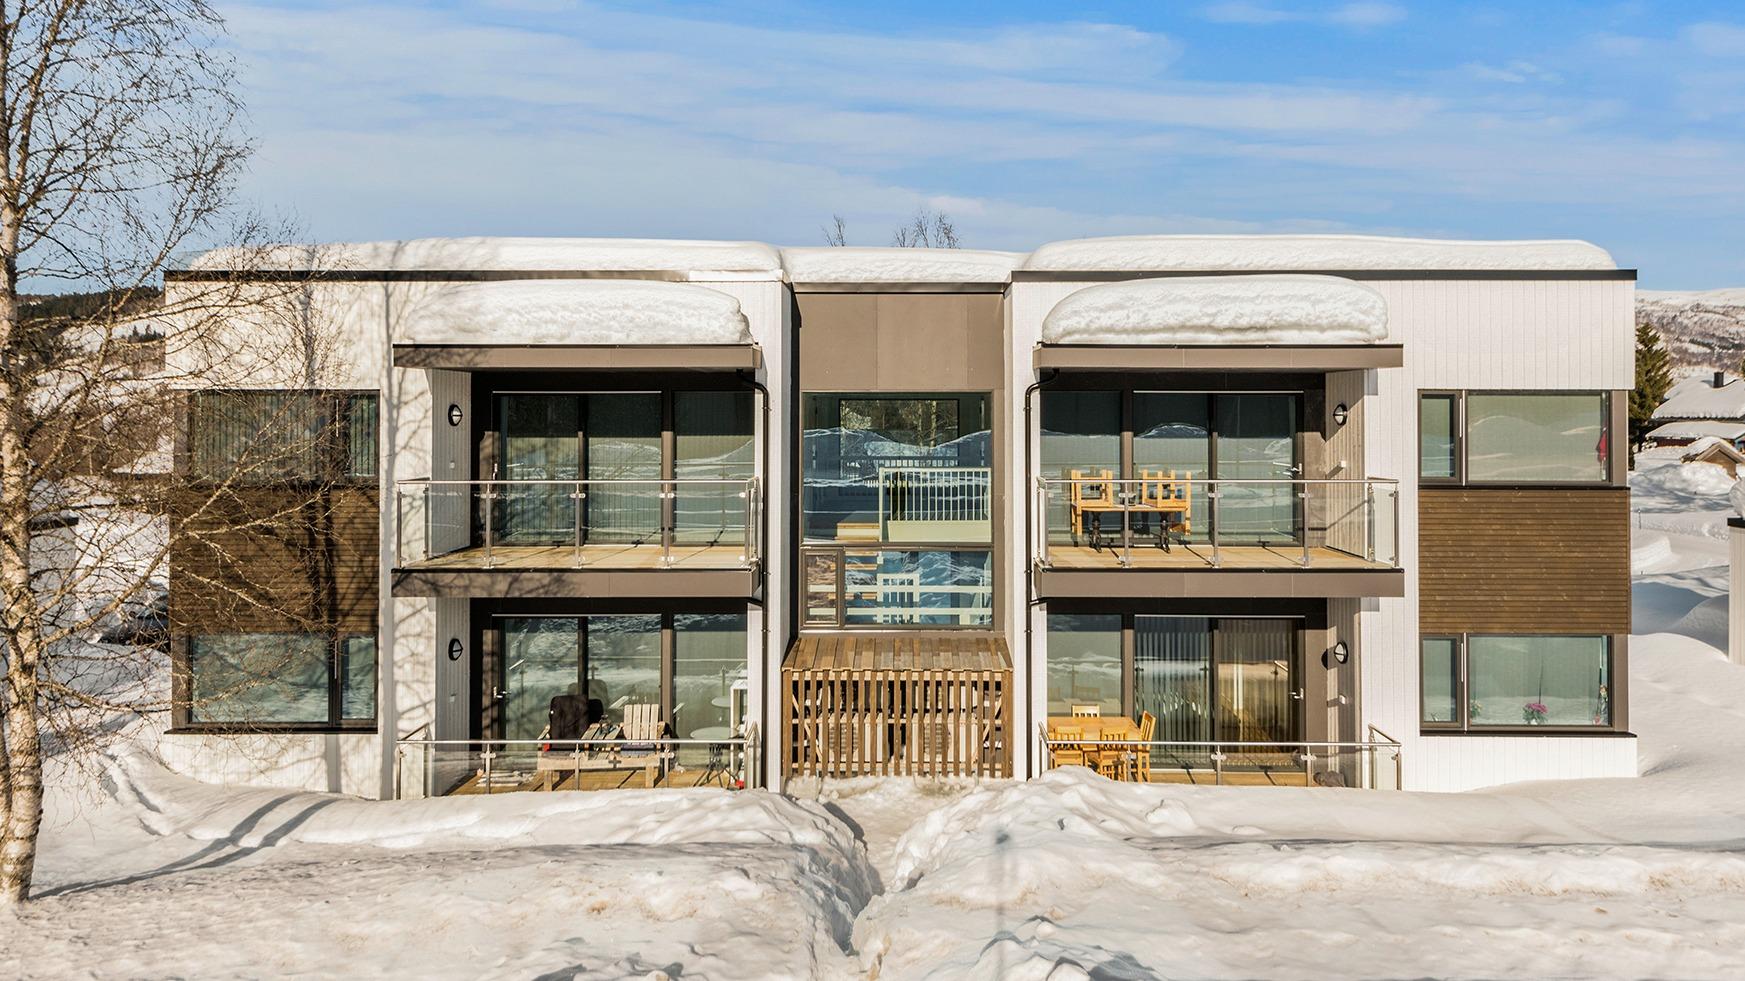 Kvartett i Rindal - Årets Småhusprosjekt 2018